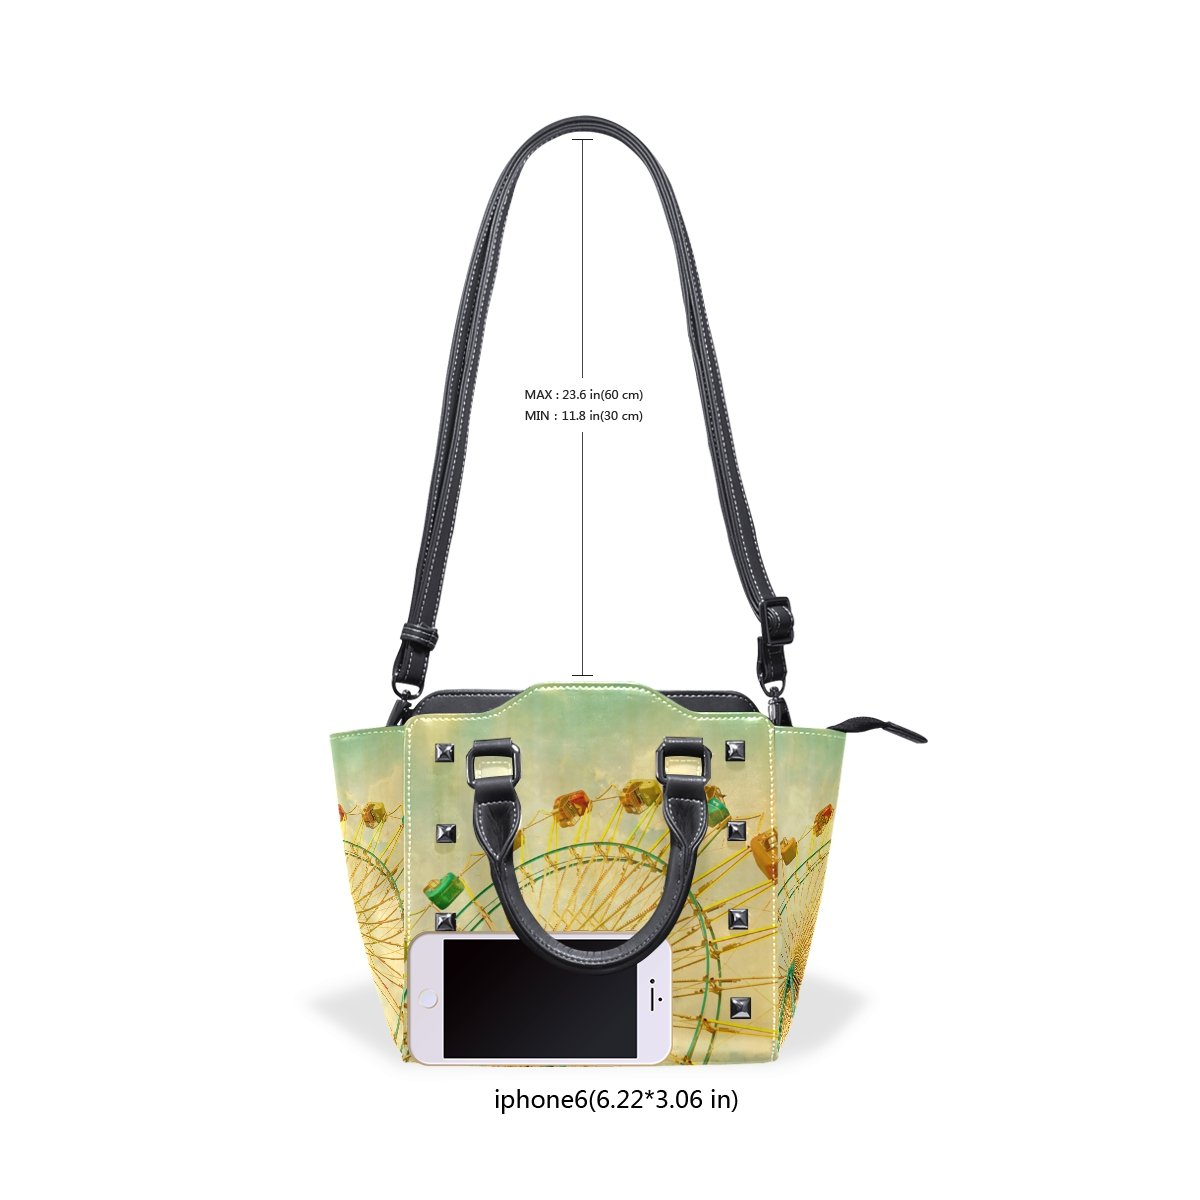 Jennifer PU Leather Top-Handle Handbags Ferris Wheel Art Single-Shoulder Tote Crossbody Bag Messenger Bags For Women